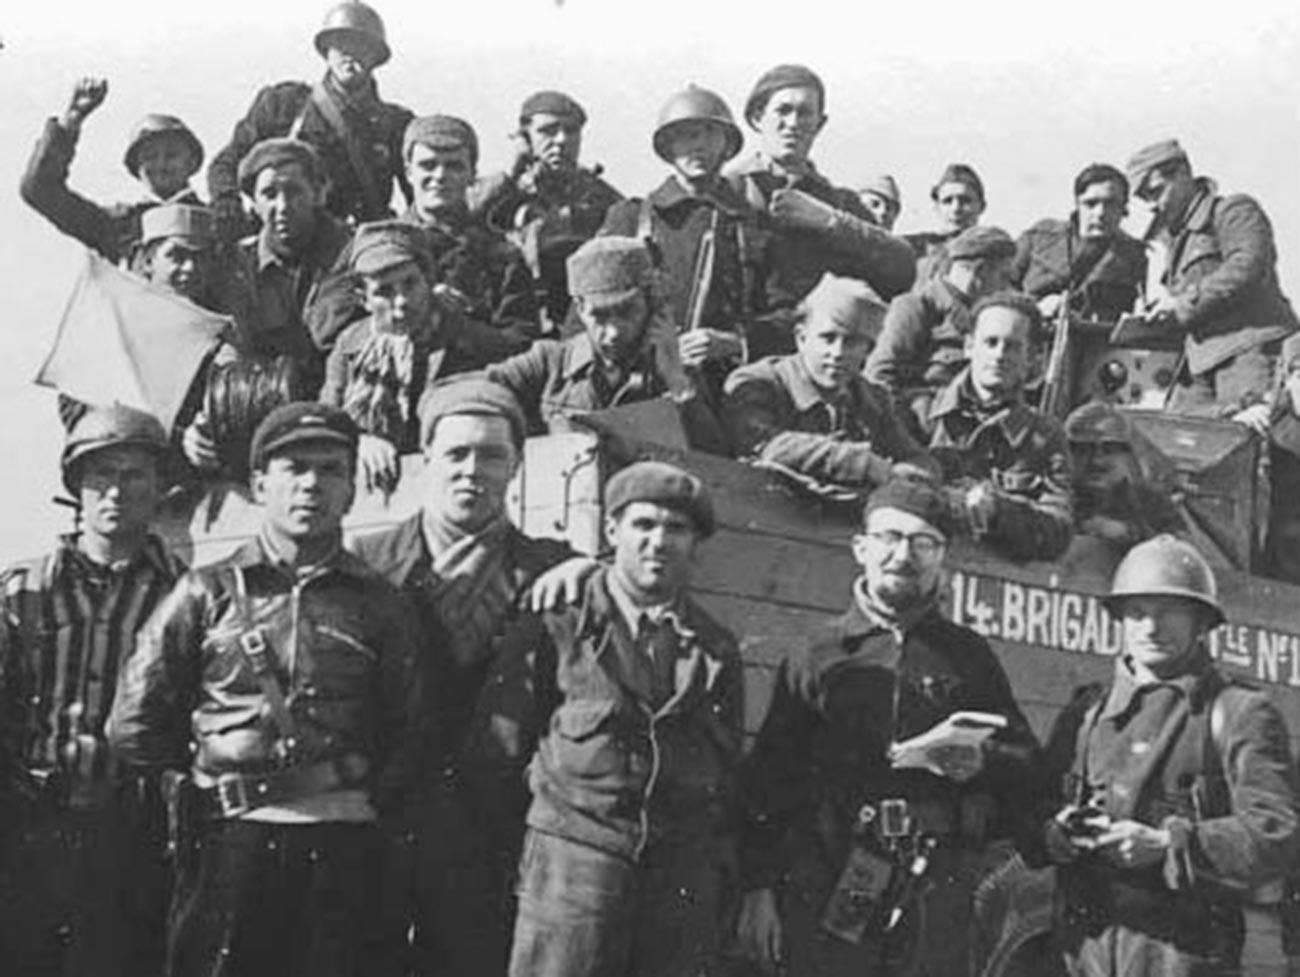 Combattants et commandants de la 14e brigade internationale à Torrelodones